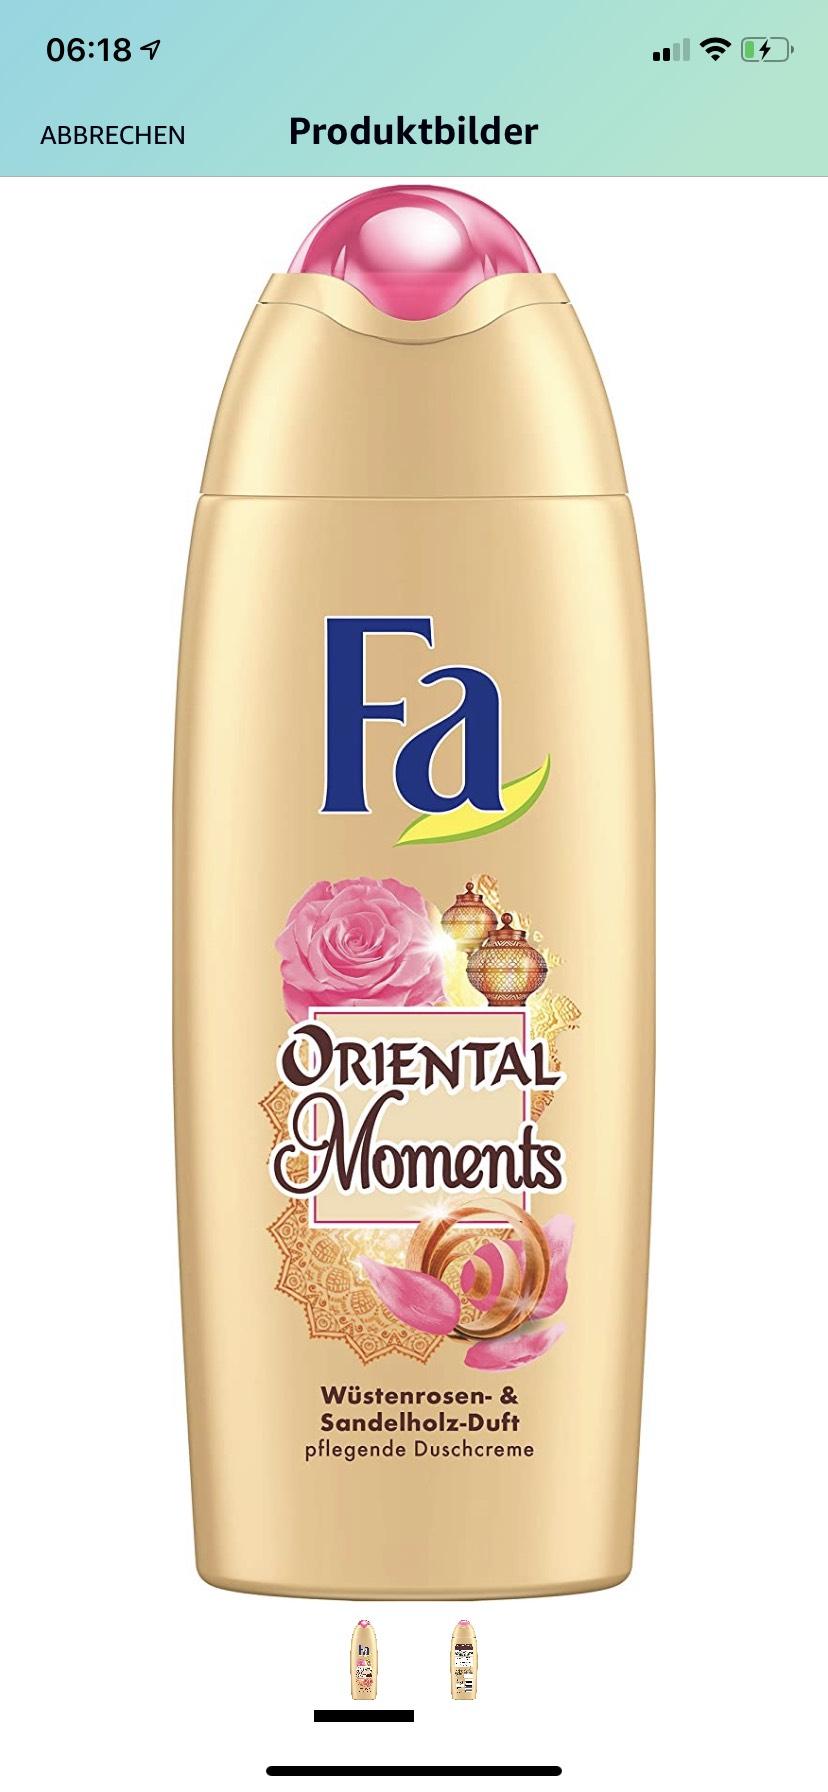 FA Duschcreme Oriental Moments mit Wüstenrosen- & Sandelholz-Duft